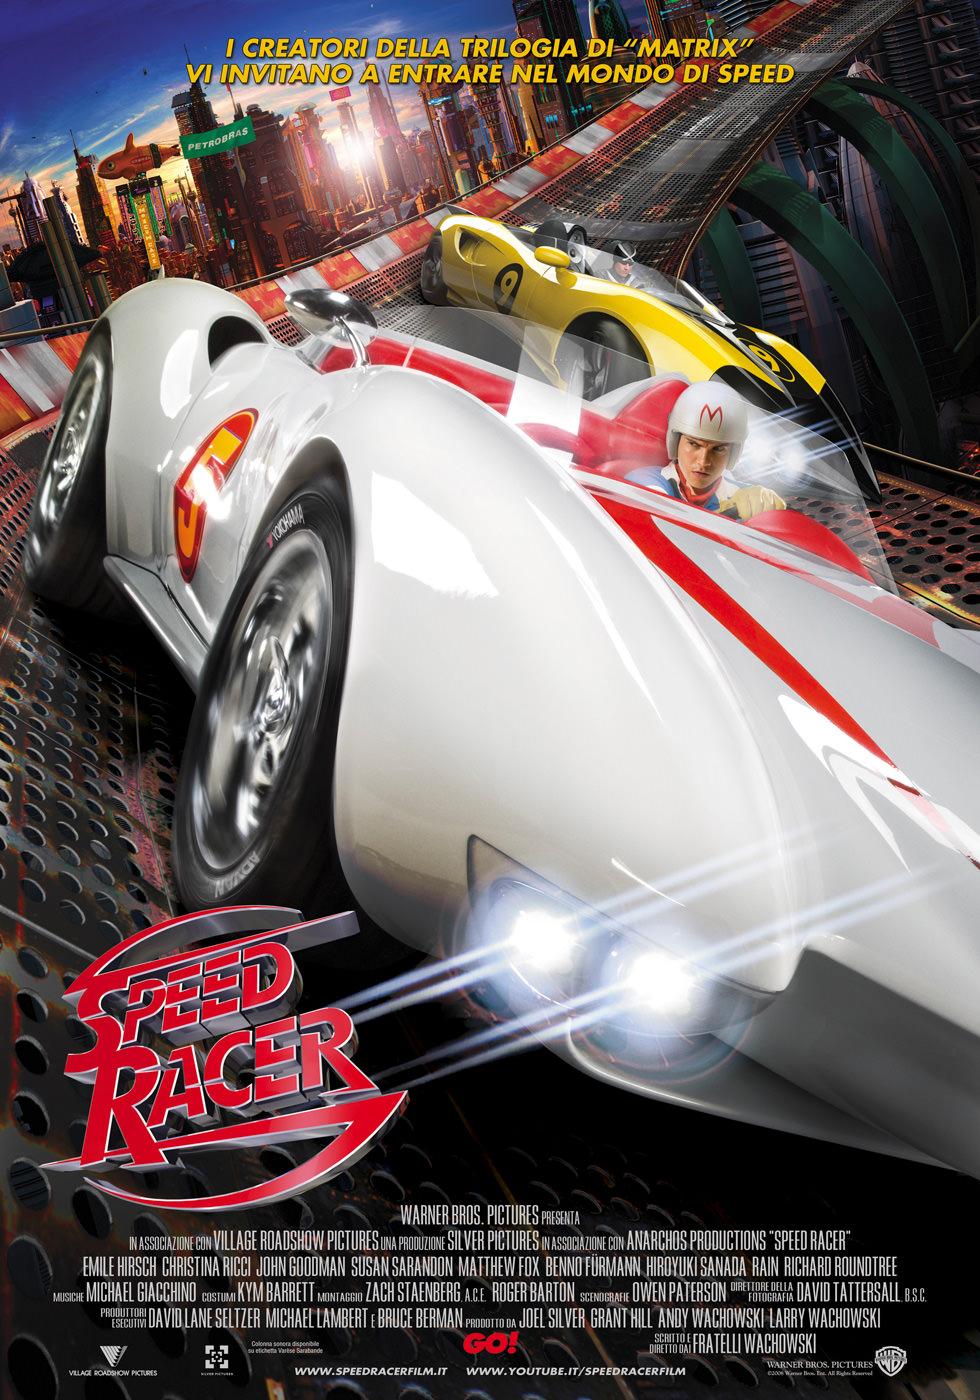 Locandina di Speed racer